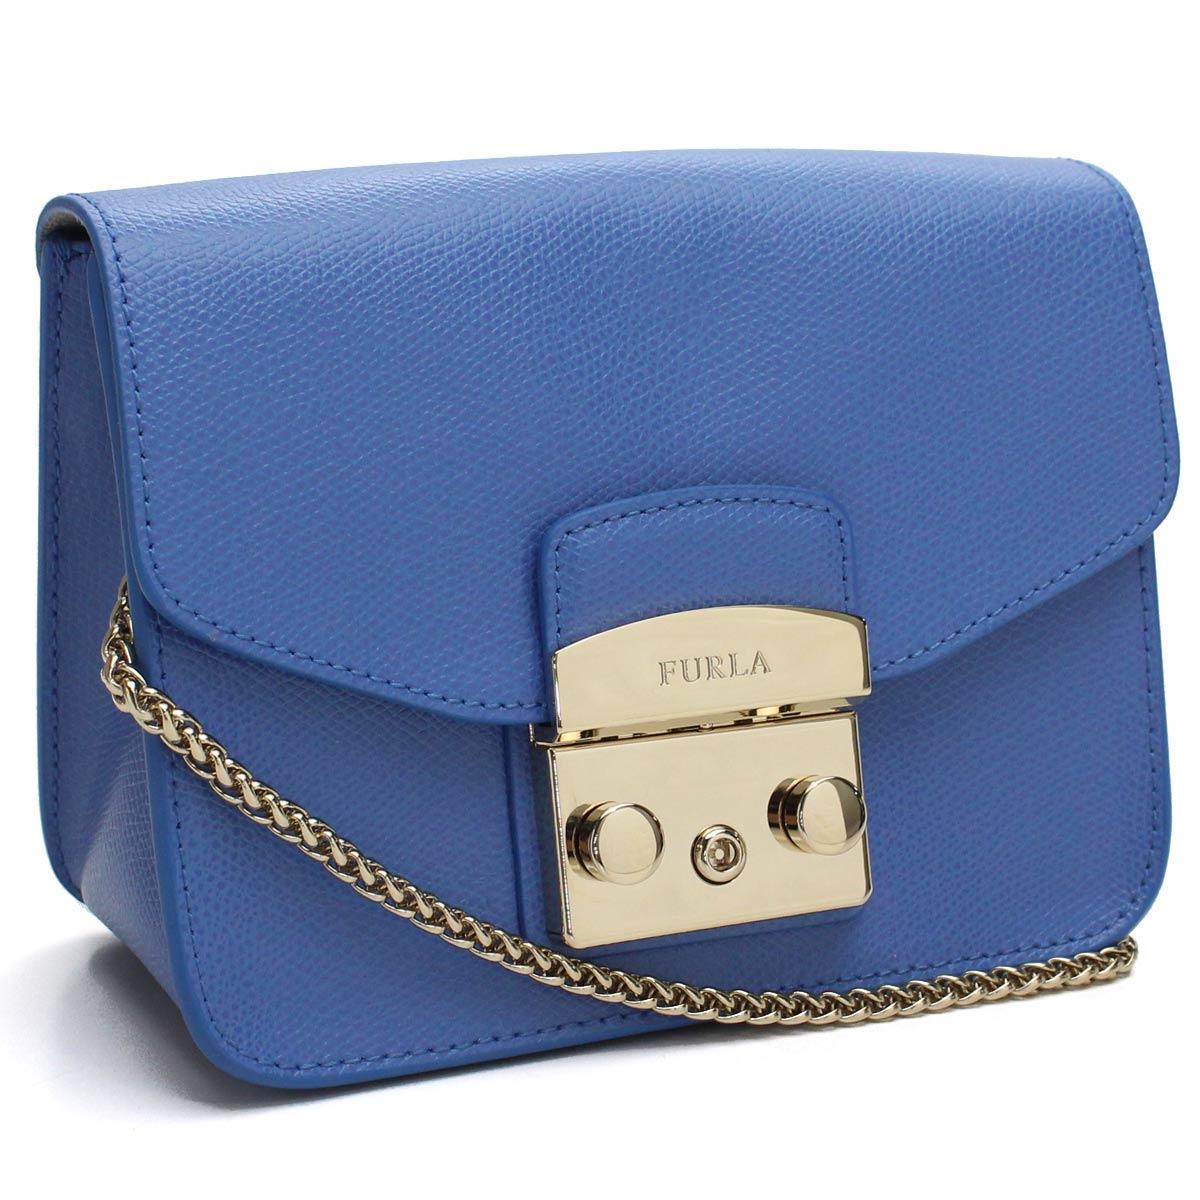 8eb7ead1c6d6 Bighit The total brand wholesale  フルラ FURLA METROPOLIS metropolis mini-crossbody  pochette BGZ7 914336 ARE CFT CELESTE blue system